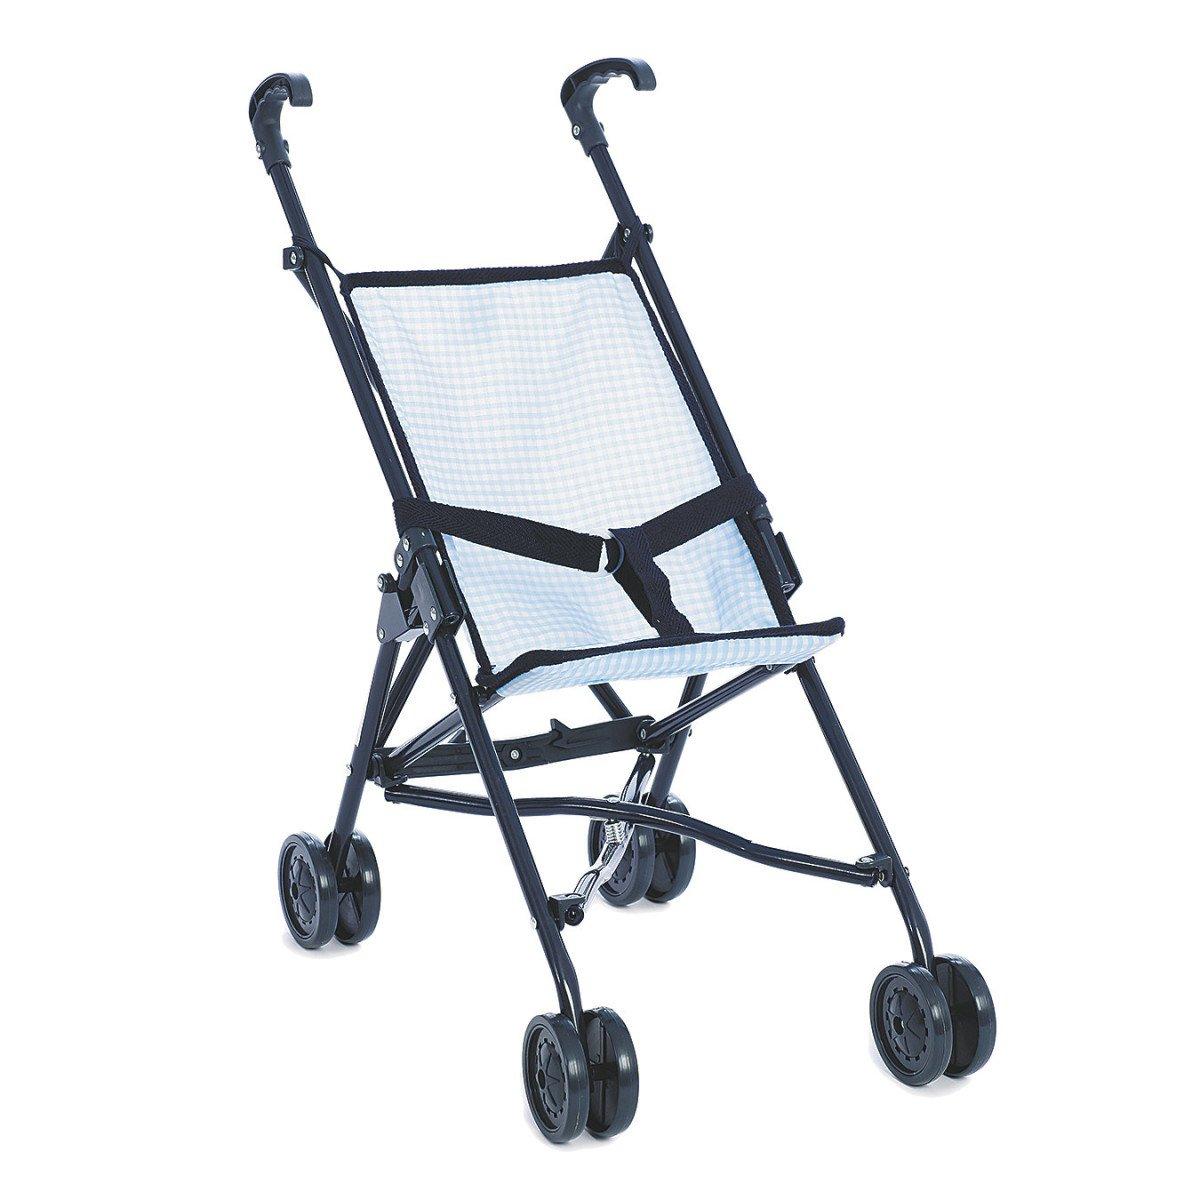 Castle Toys Umbrella Doll Stroller Getting Fit 714116125440